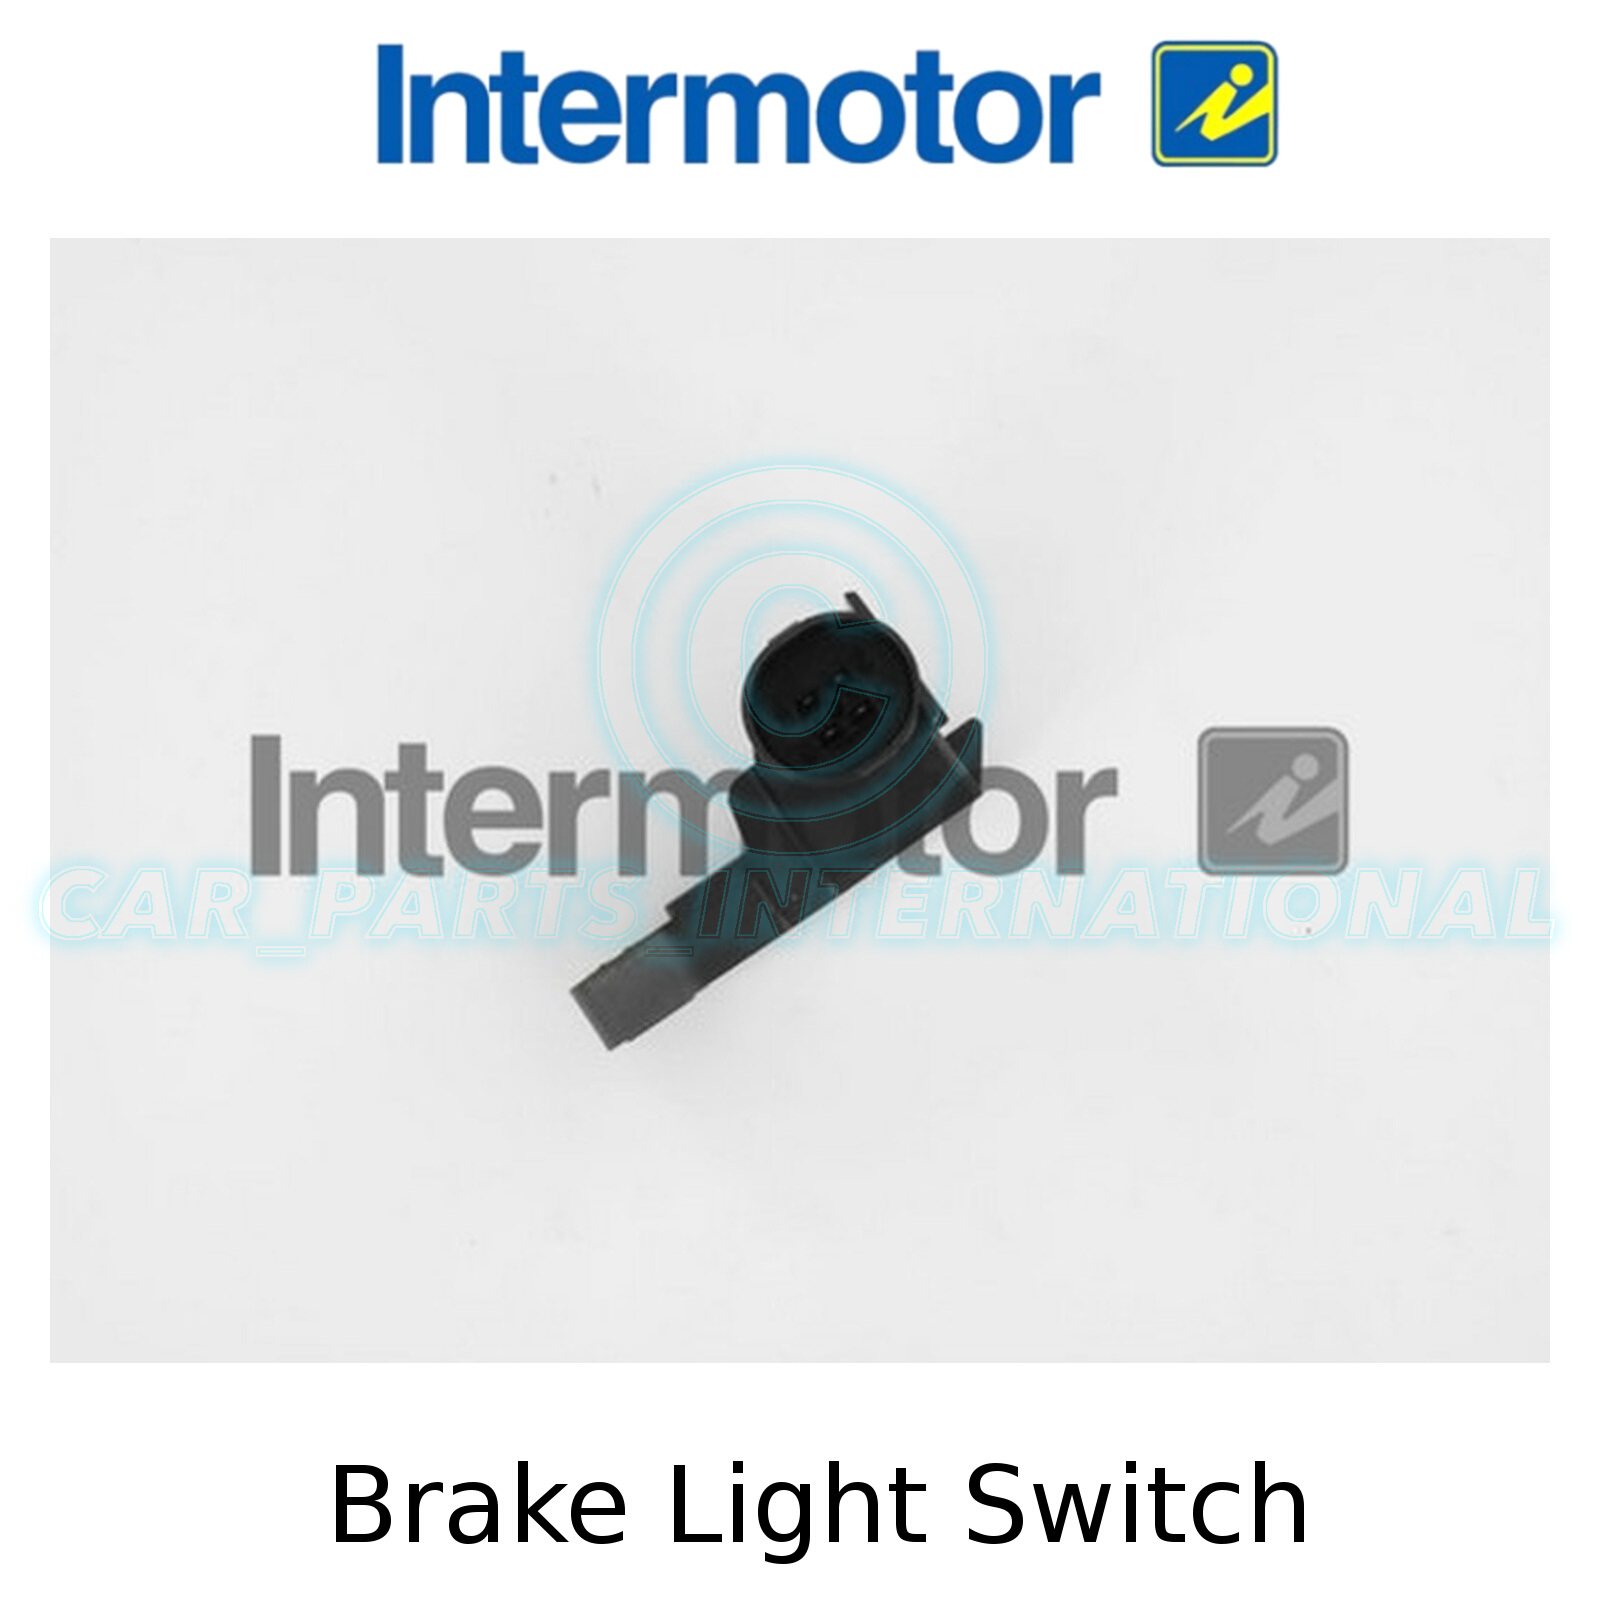 Genuine Intermotor Brake Light Switch 51810